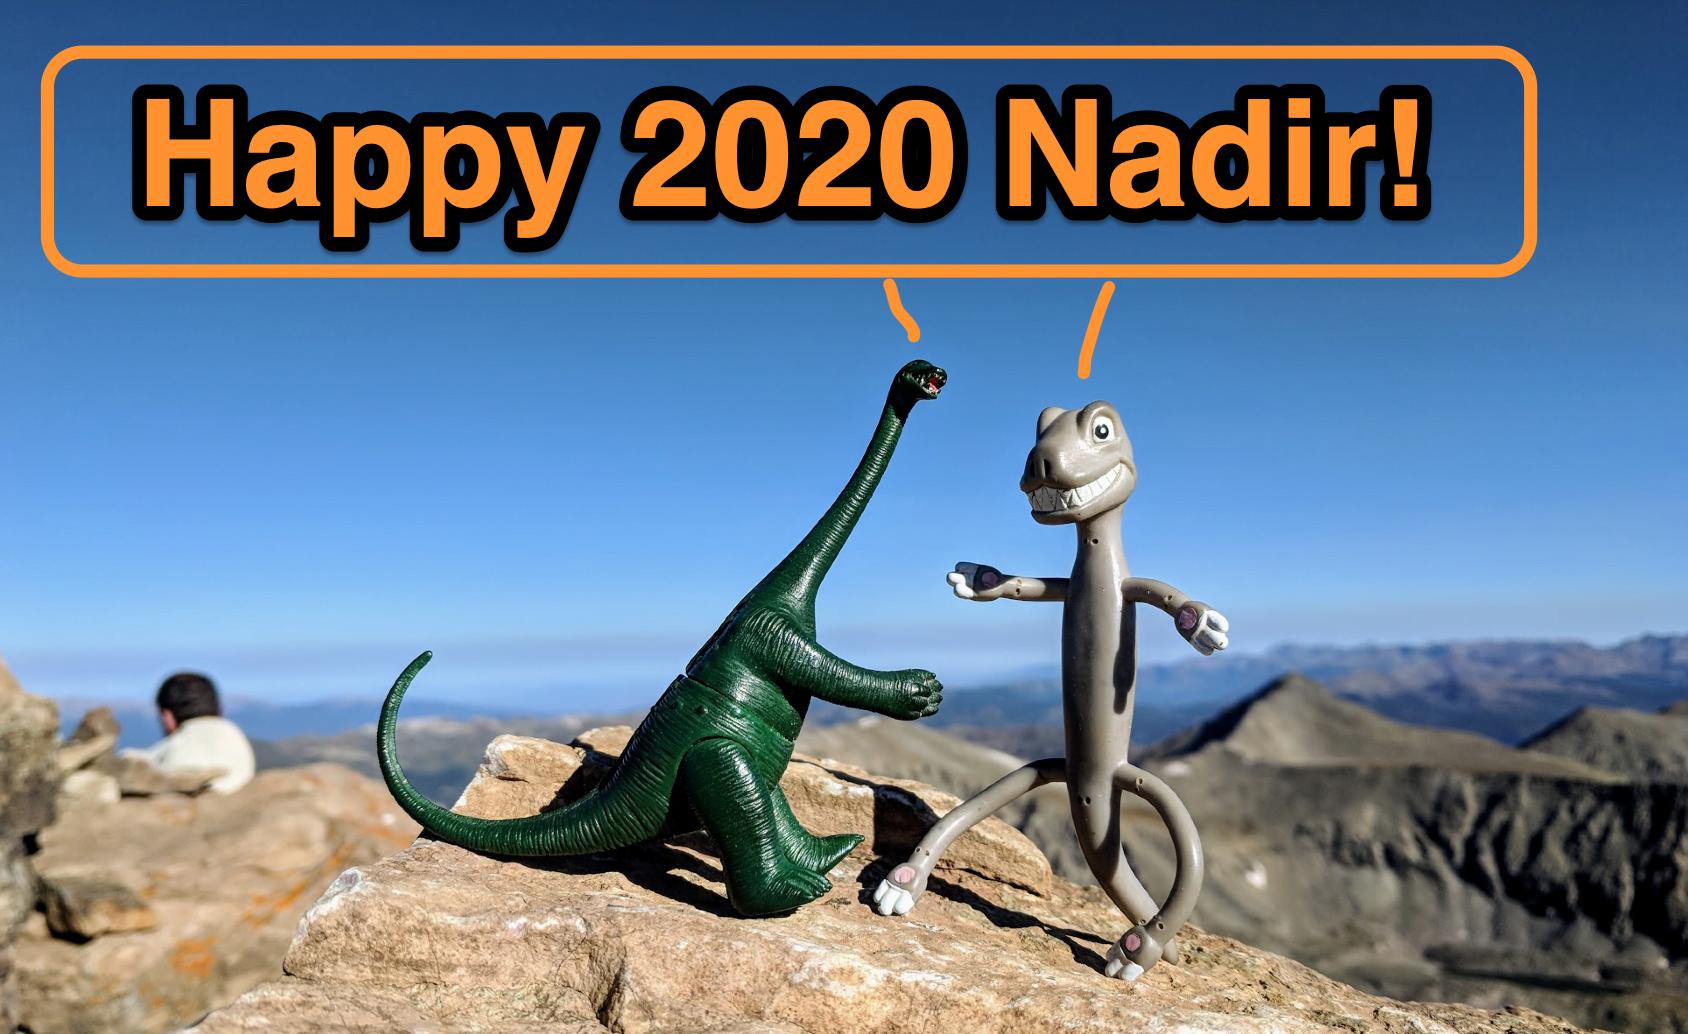 2020!